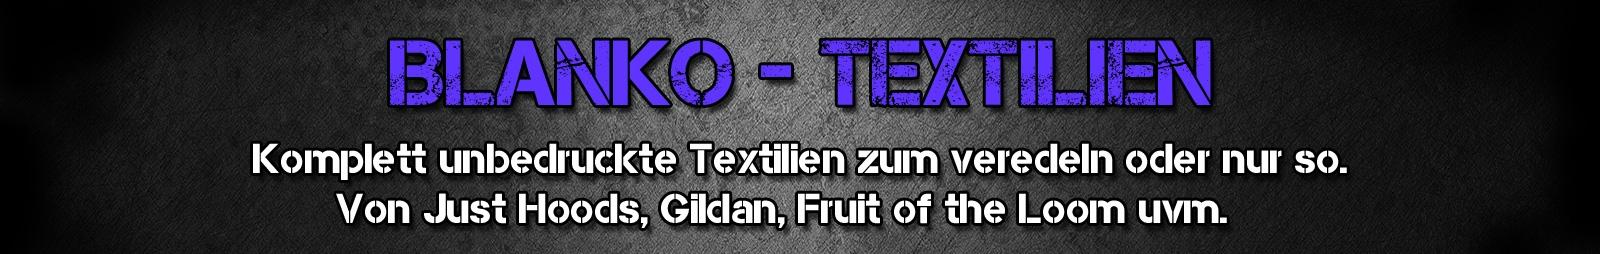 Blanko - Textilien